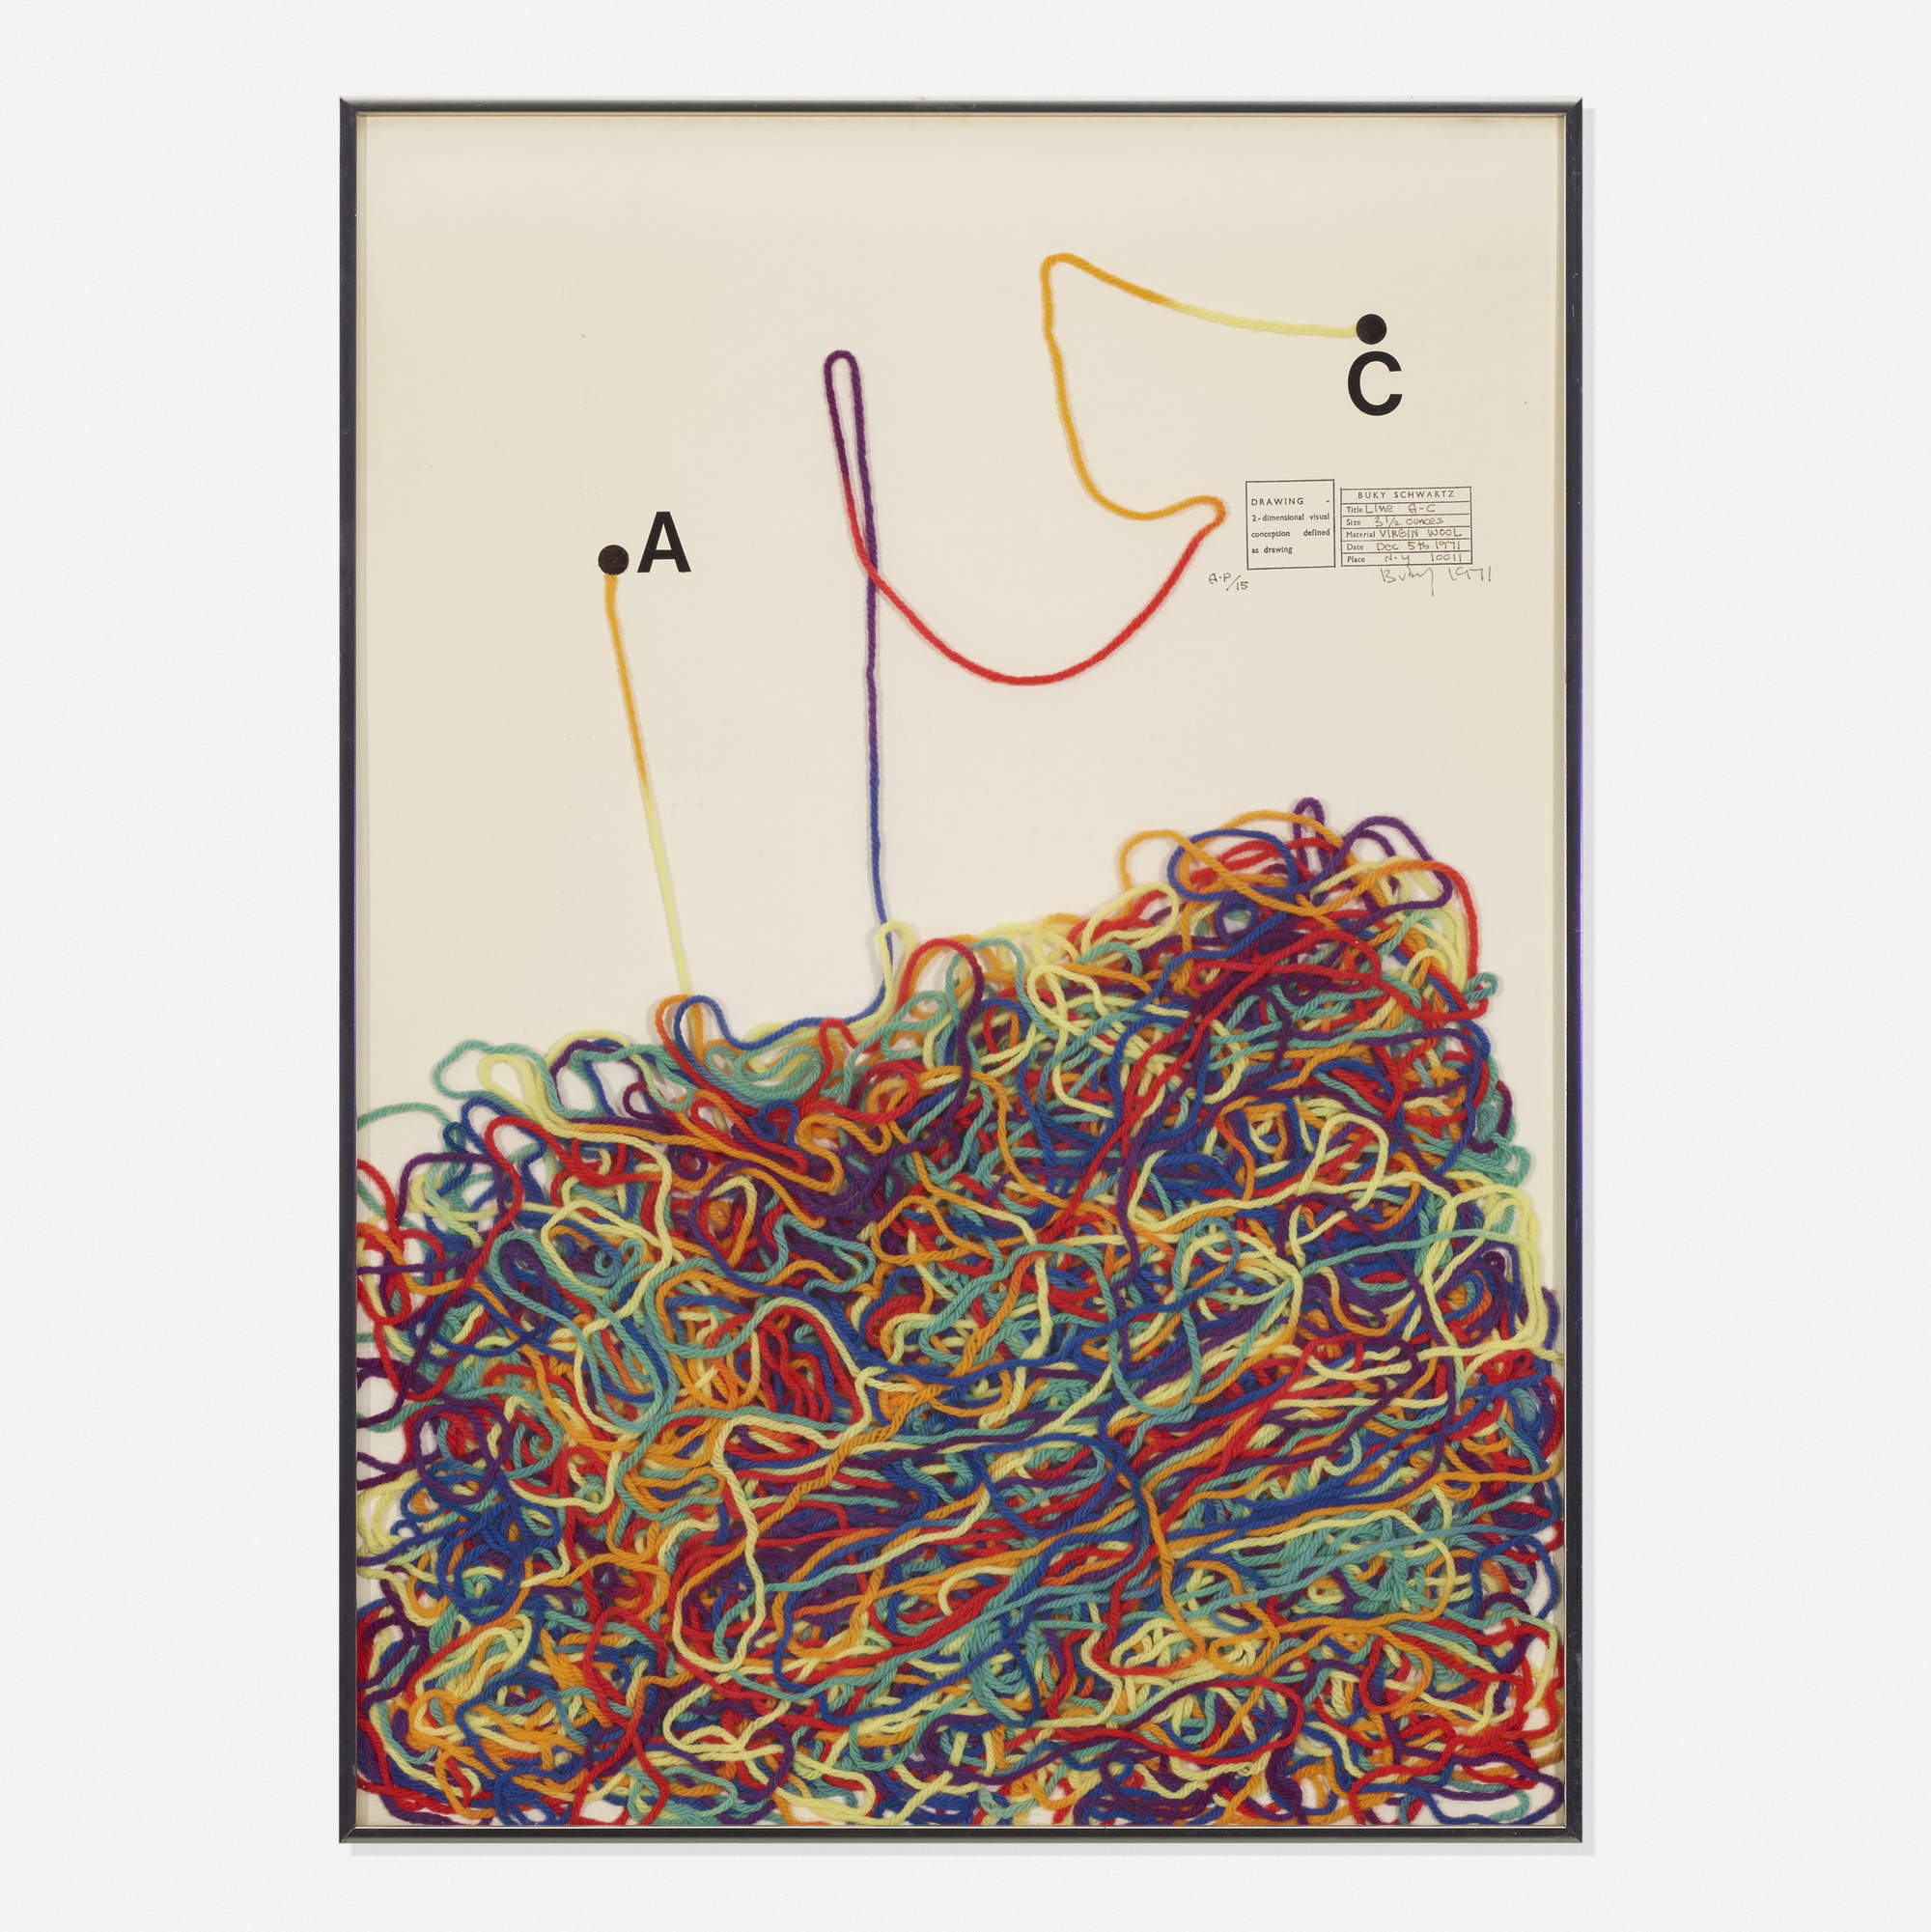 721: Buky Schwartz / Line A-C (1 of 1)